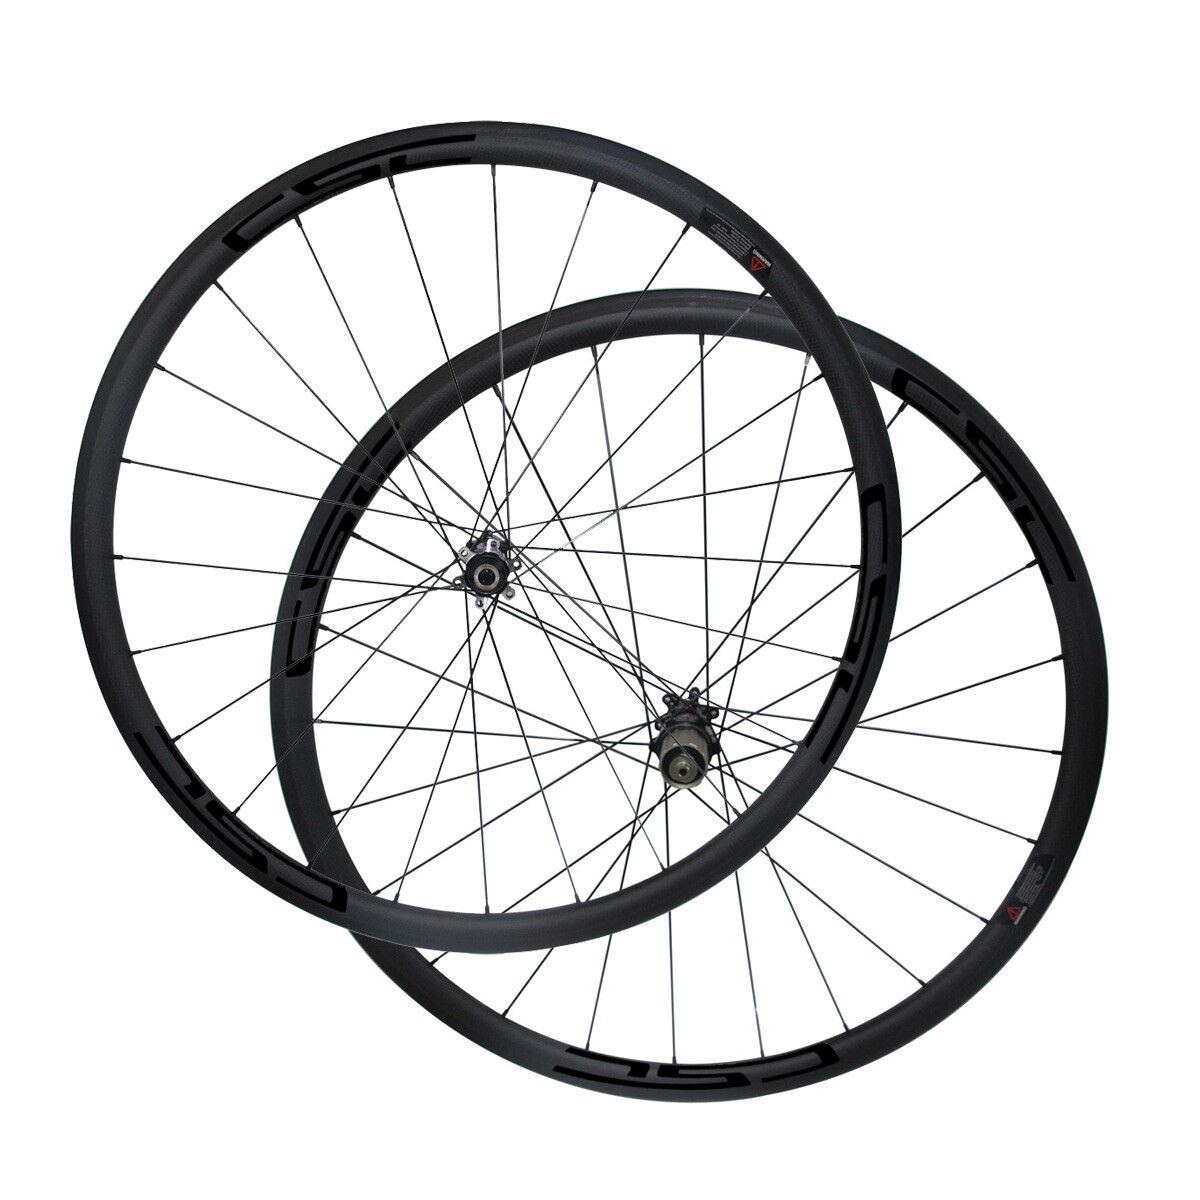 Straight Pull 700C Cyclocross Disc Wheelset Clincher Tubular Bike Wheels  6 Bolt